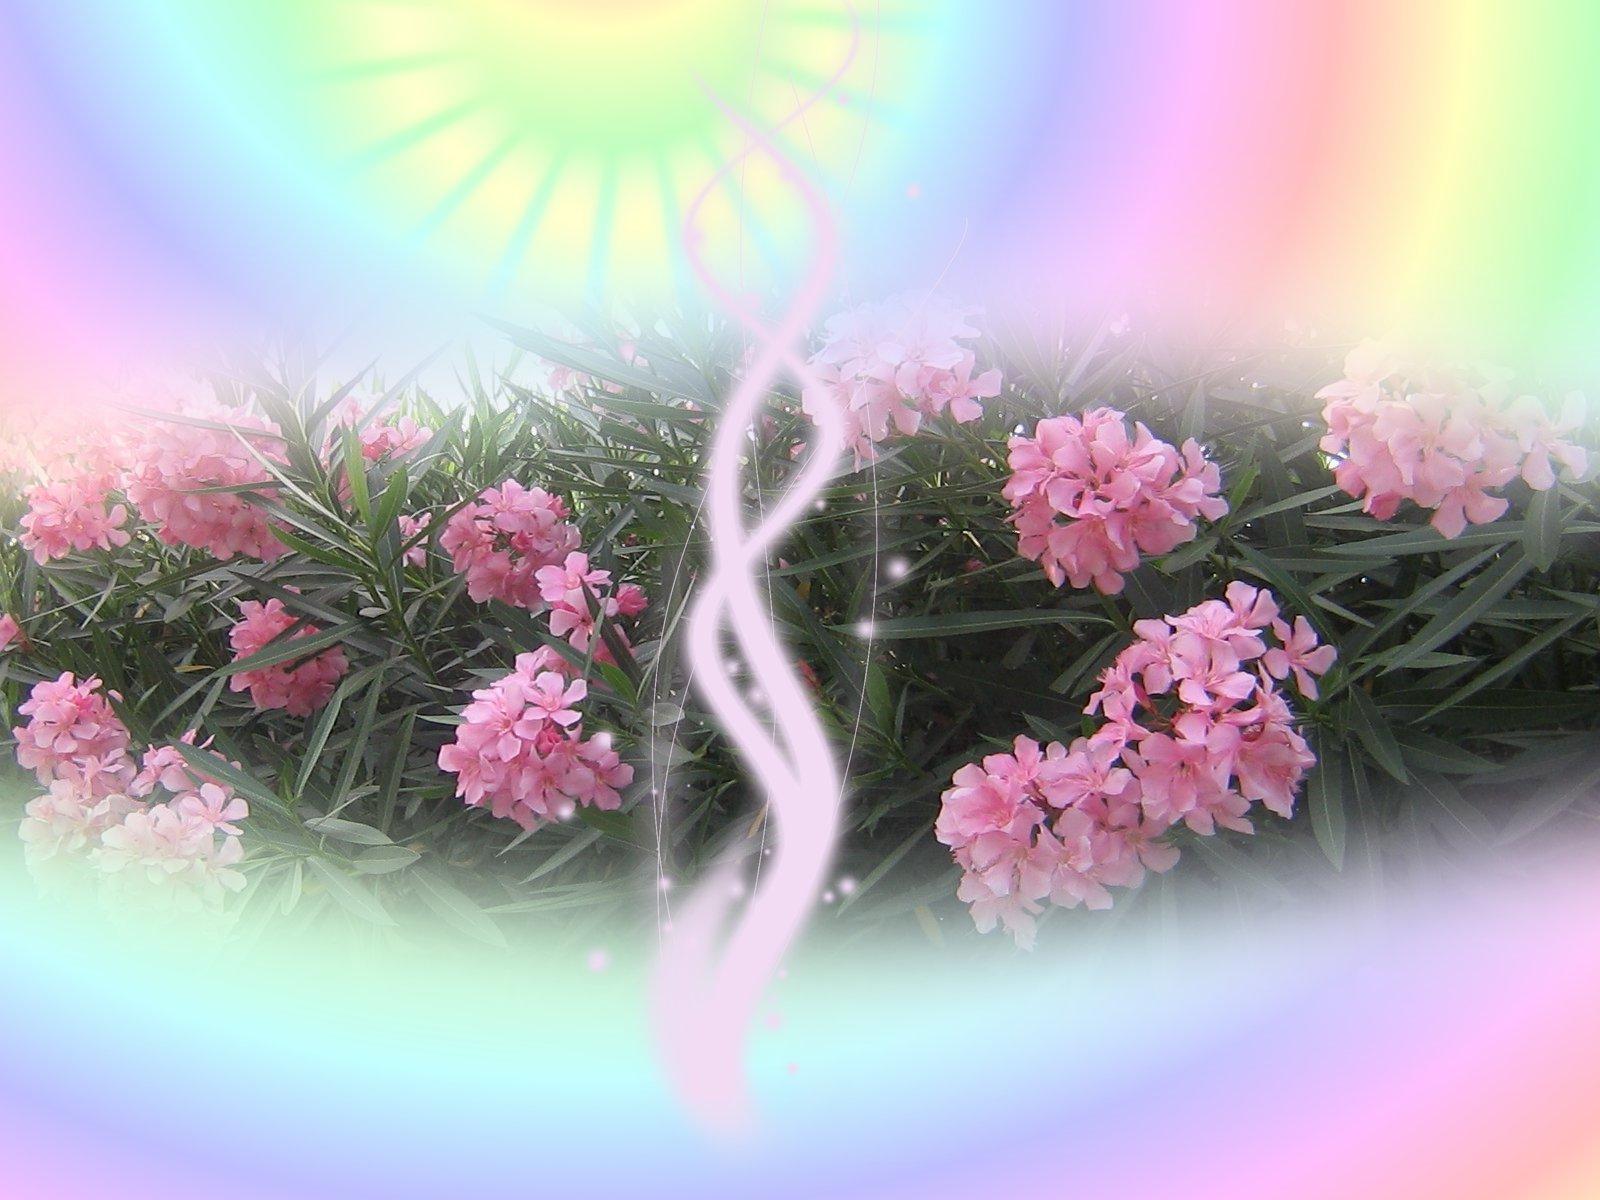 http://1.bp.blogspot.com/-IOINF-kZiXM/TaWtx4SPpgI/AAAAAAAACAc/QgBFNEKPibw/s1600/spring+wallpapers_%255Bwww.thewallpaperdb.blogspot.com+%255D_+%252841%2529.jpg